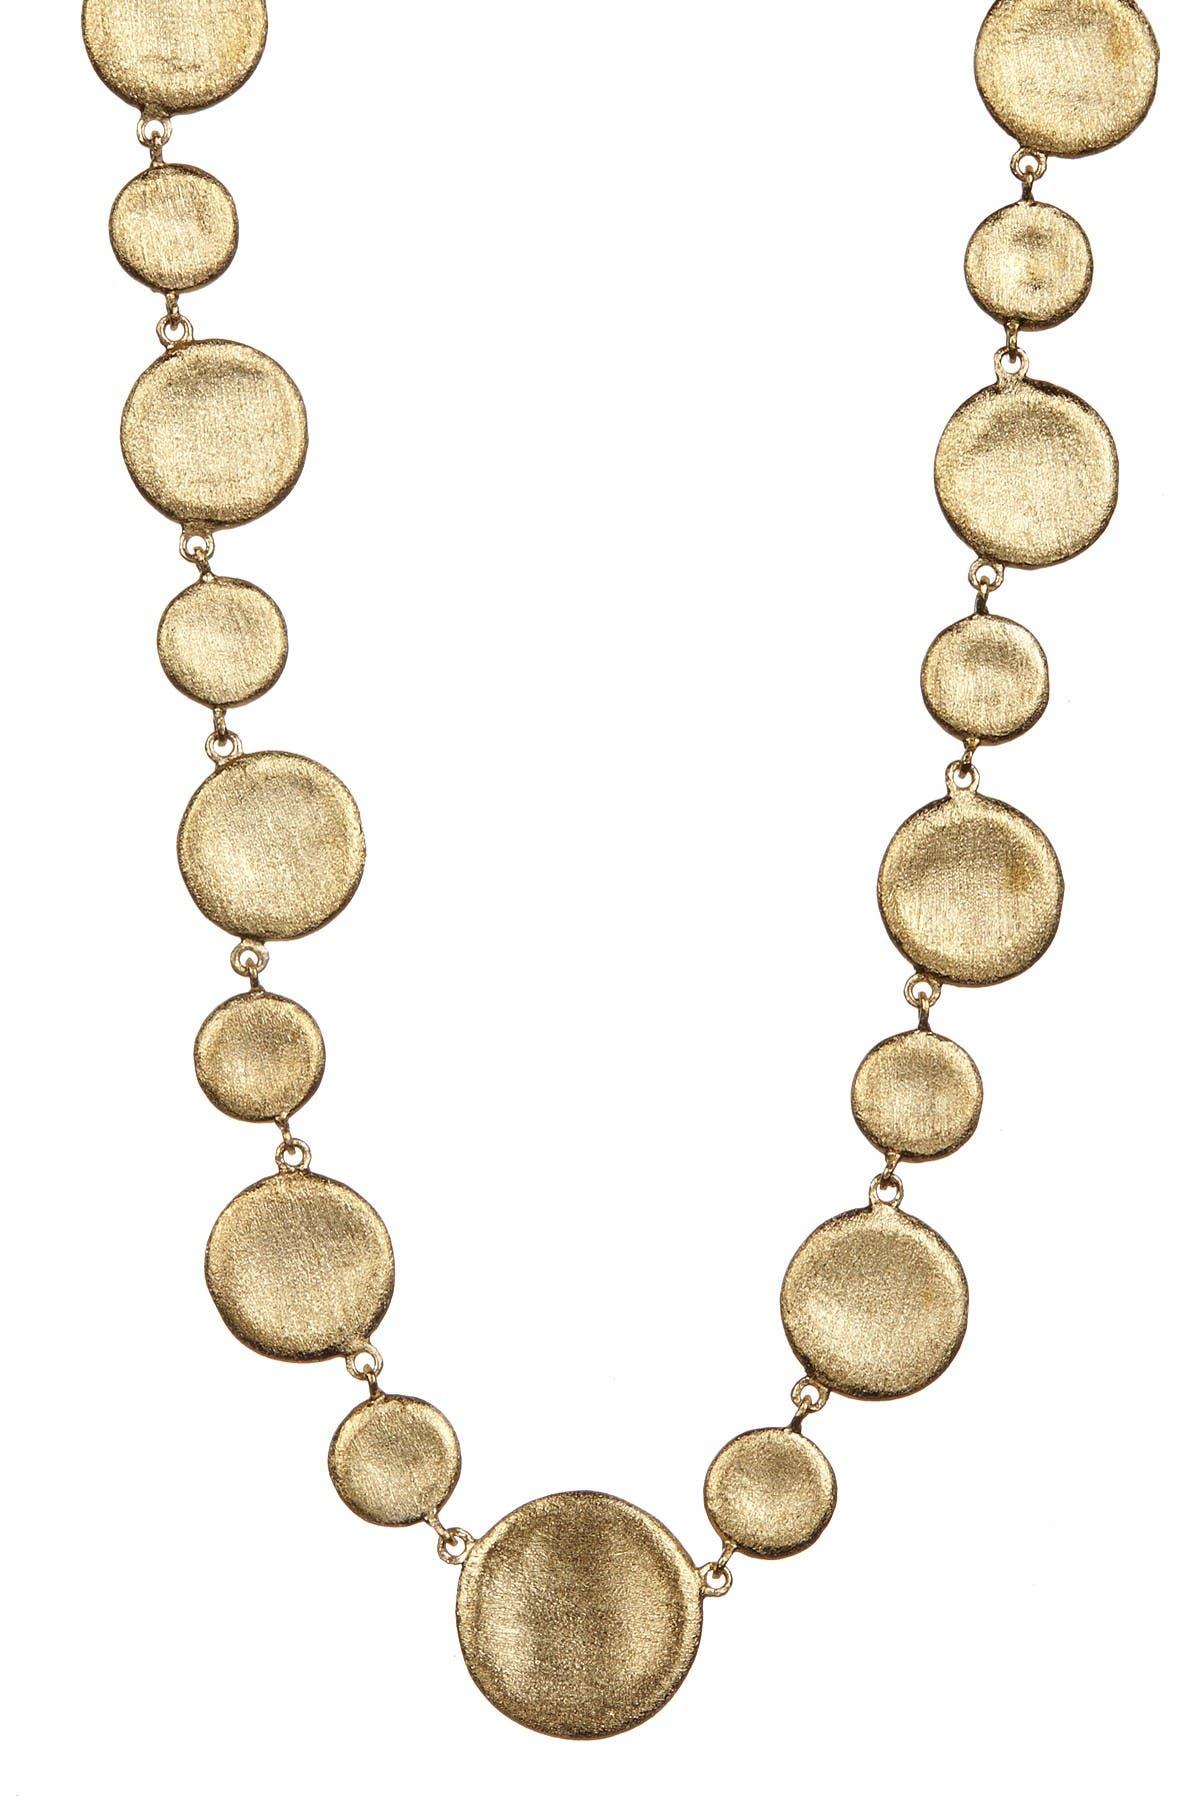 Image of Rivka Friedman 18K Gold Clad Concave Alternating Pebble Necklace